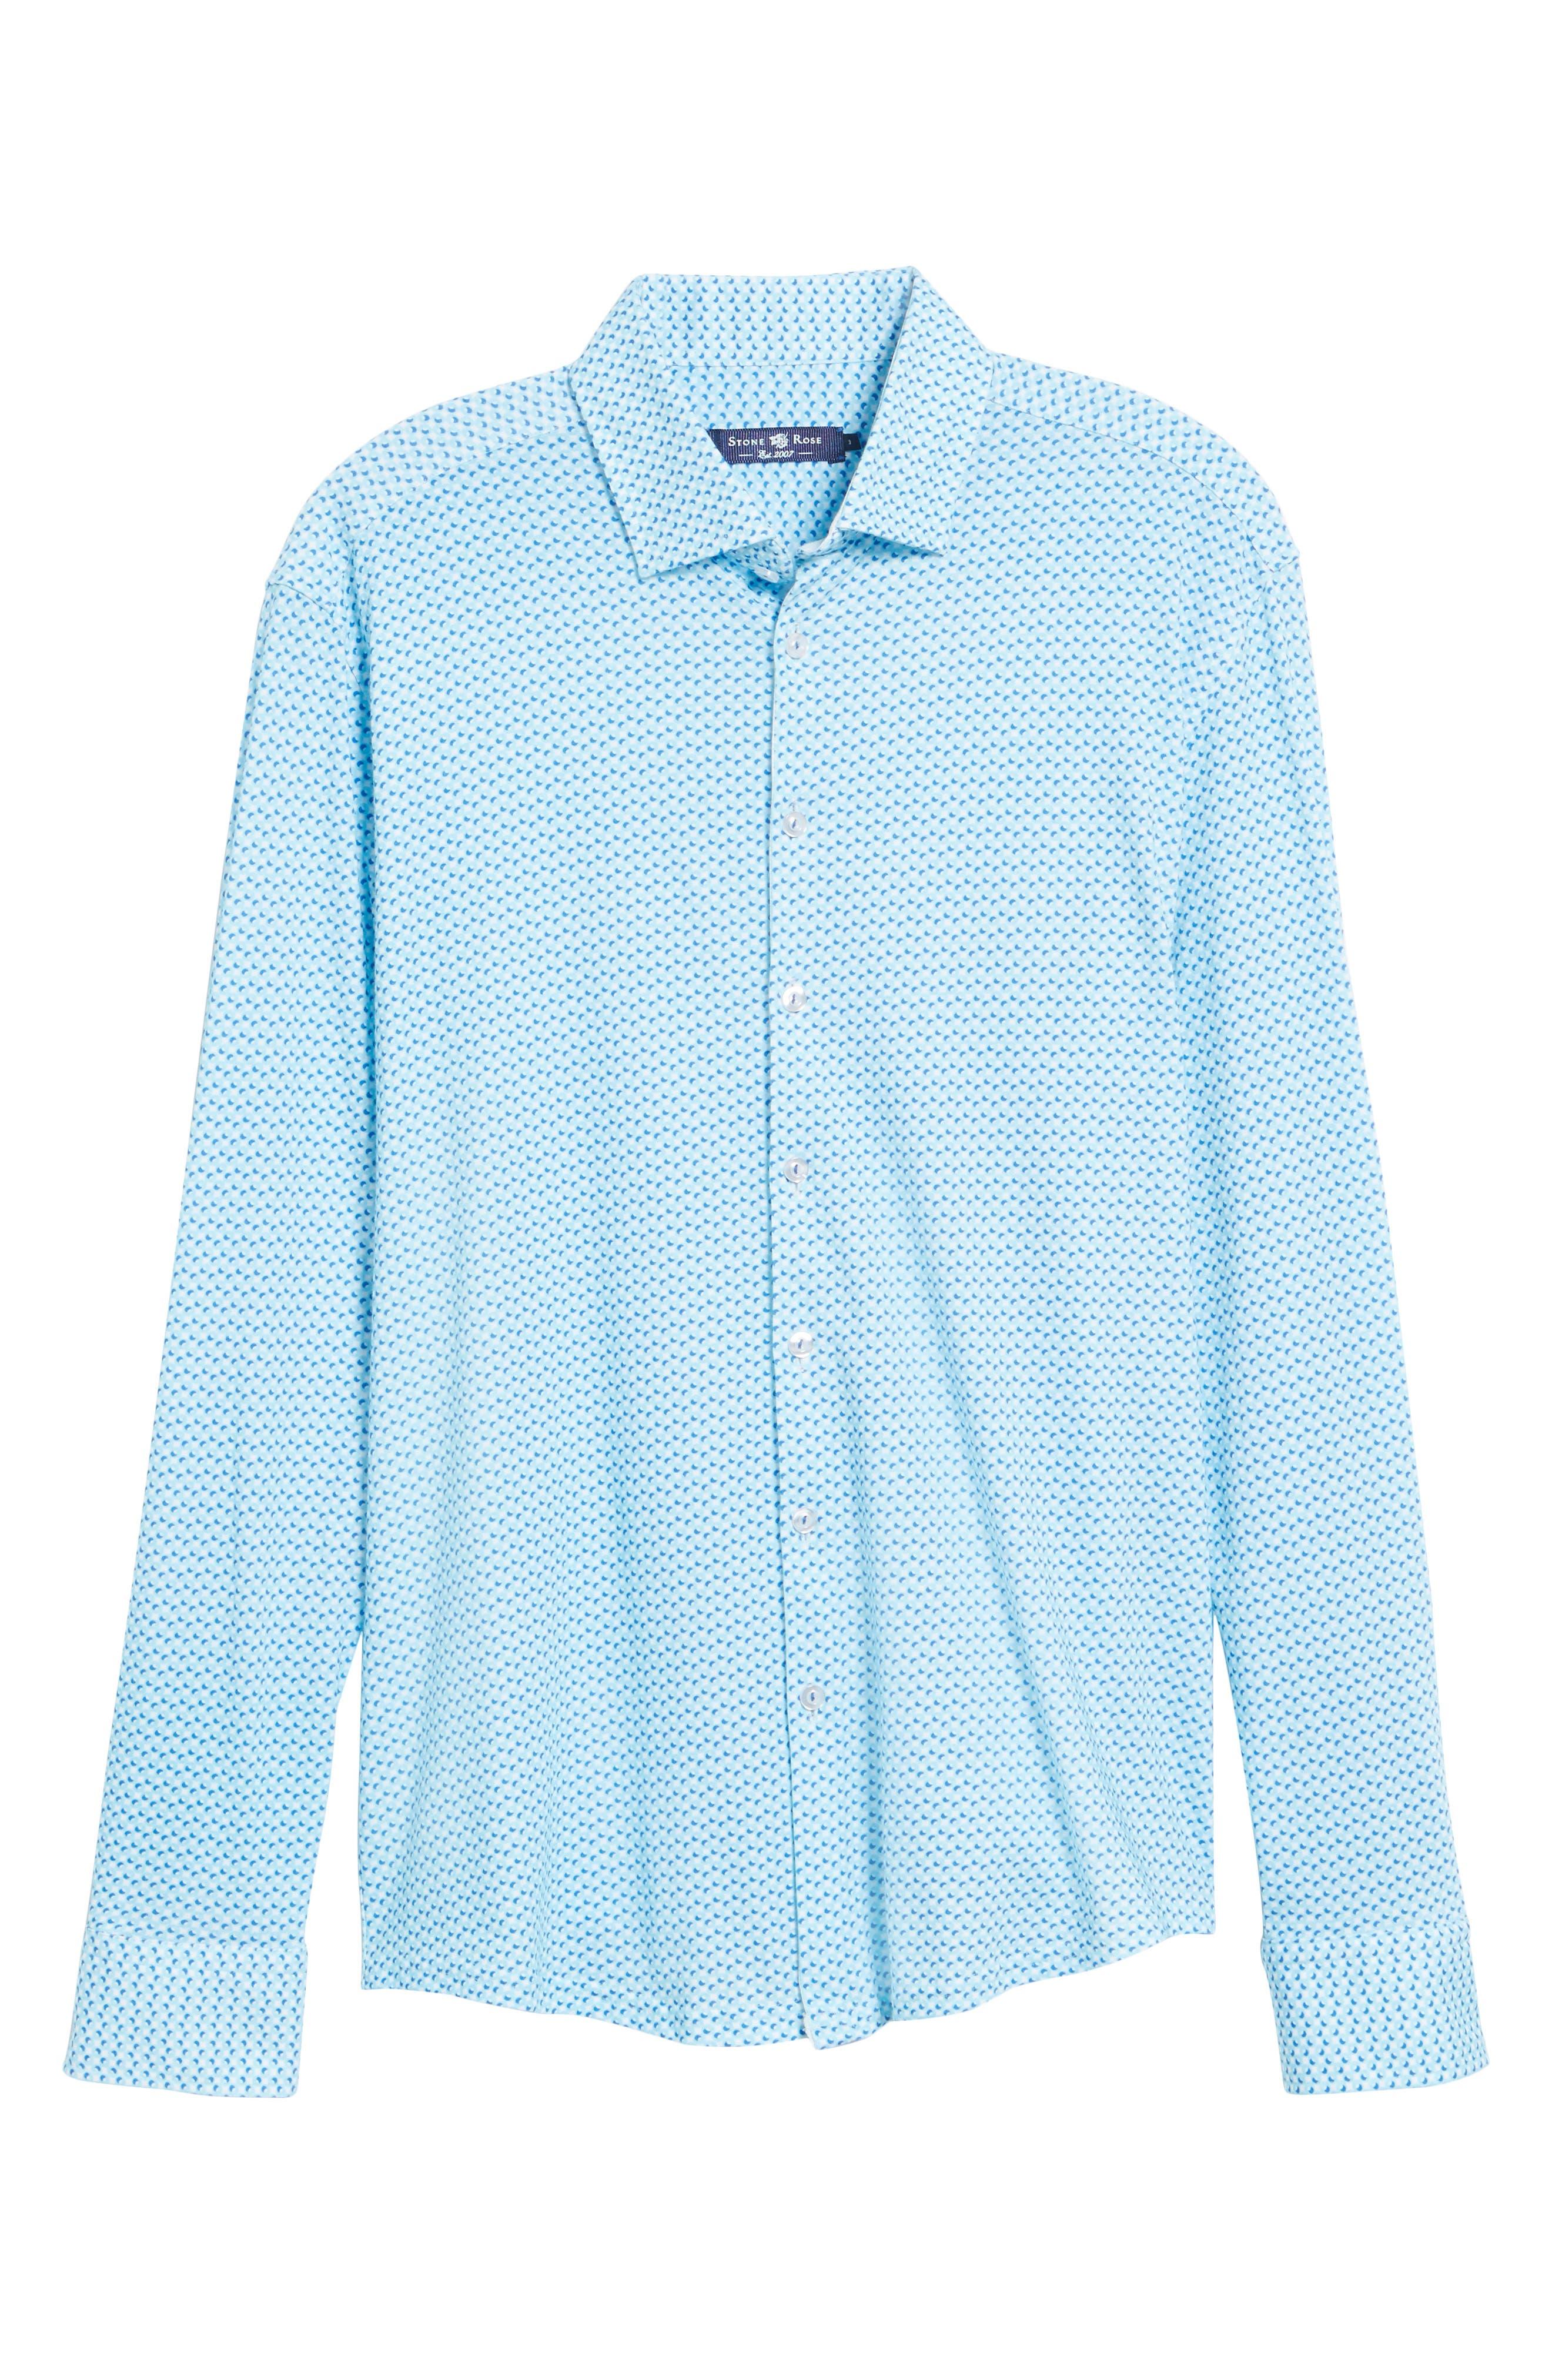 Contemporary Fit Circle Print Sport Shirt,                             Alternate thumbnail 6, color,                             400